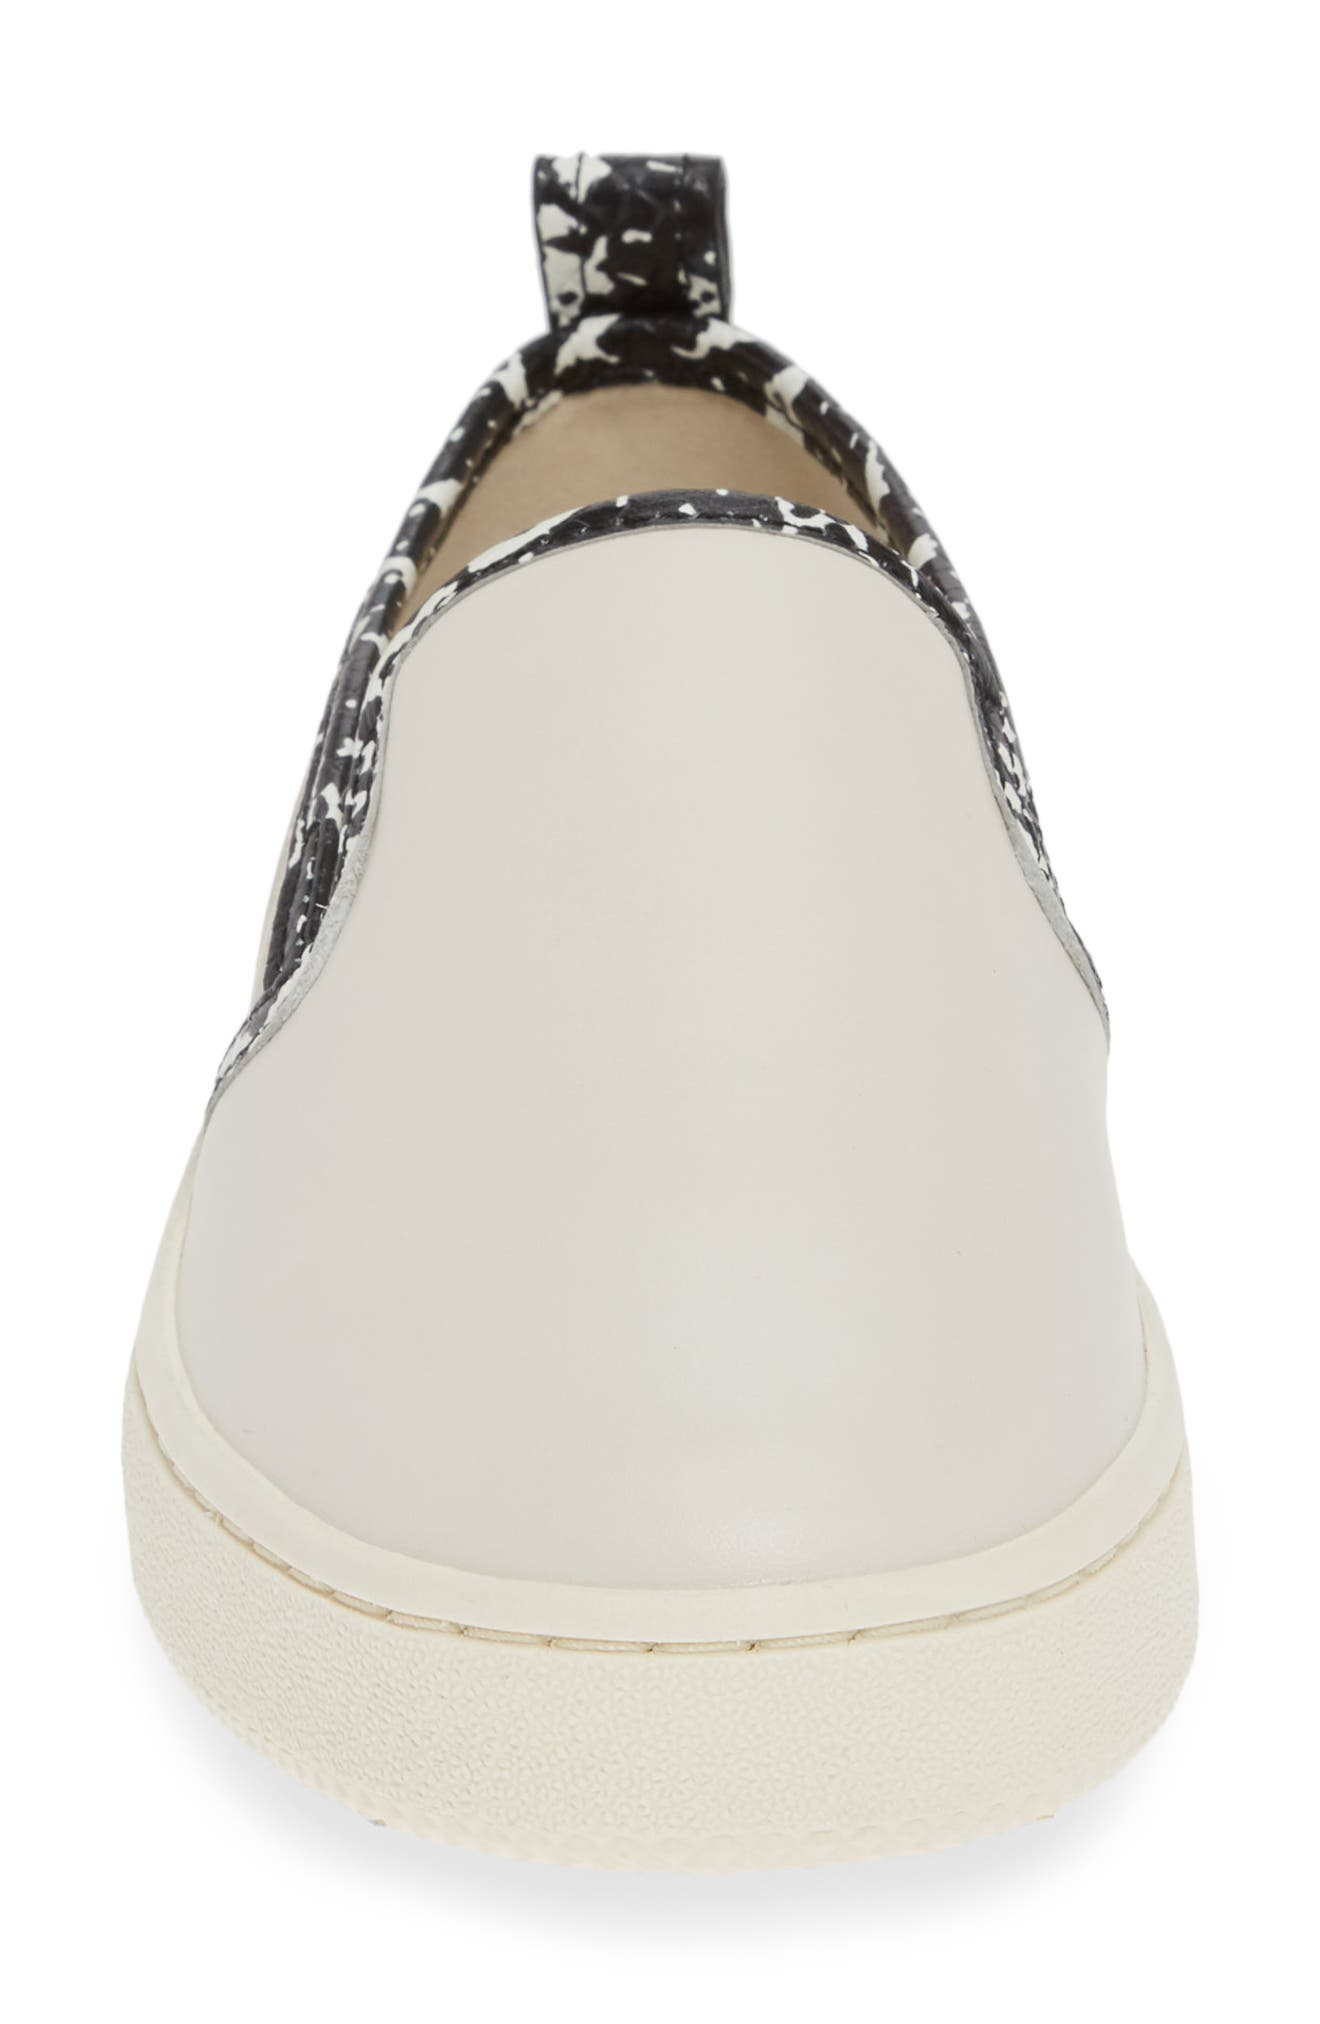 Colorblock Slip-On Sneaker,                             Alternate thumbnail 4, color,                             CHALK/ NATURAL/ CHAMPAGNE